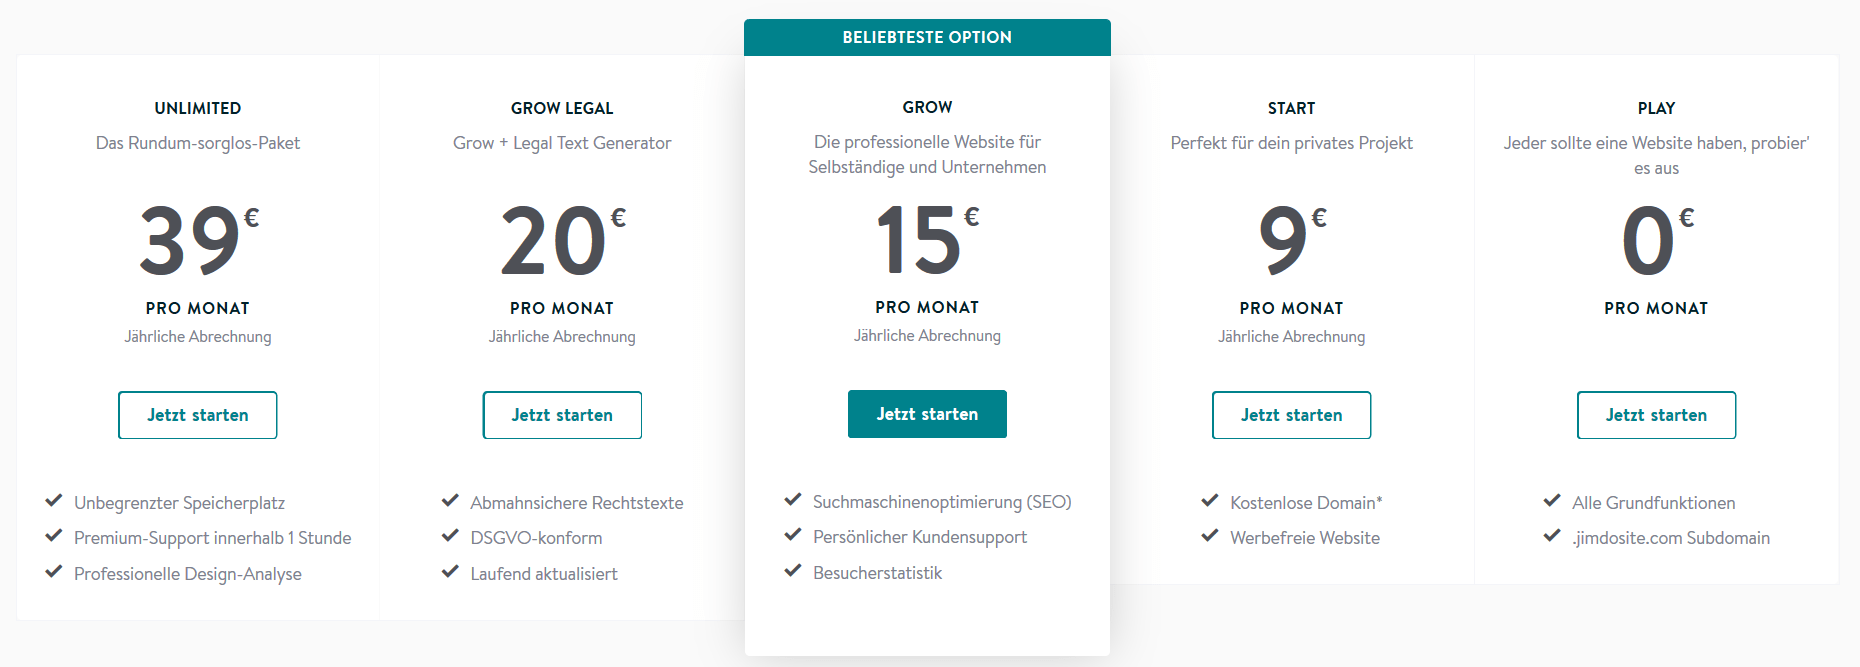 Jimdo Website Baukasten Test Preismodelle